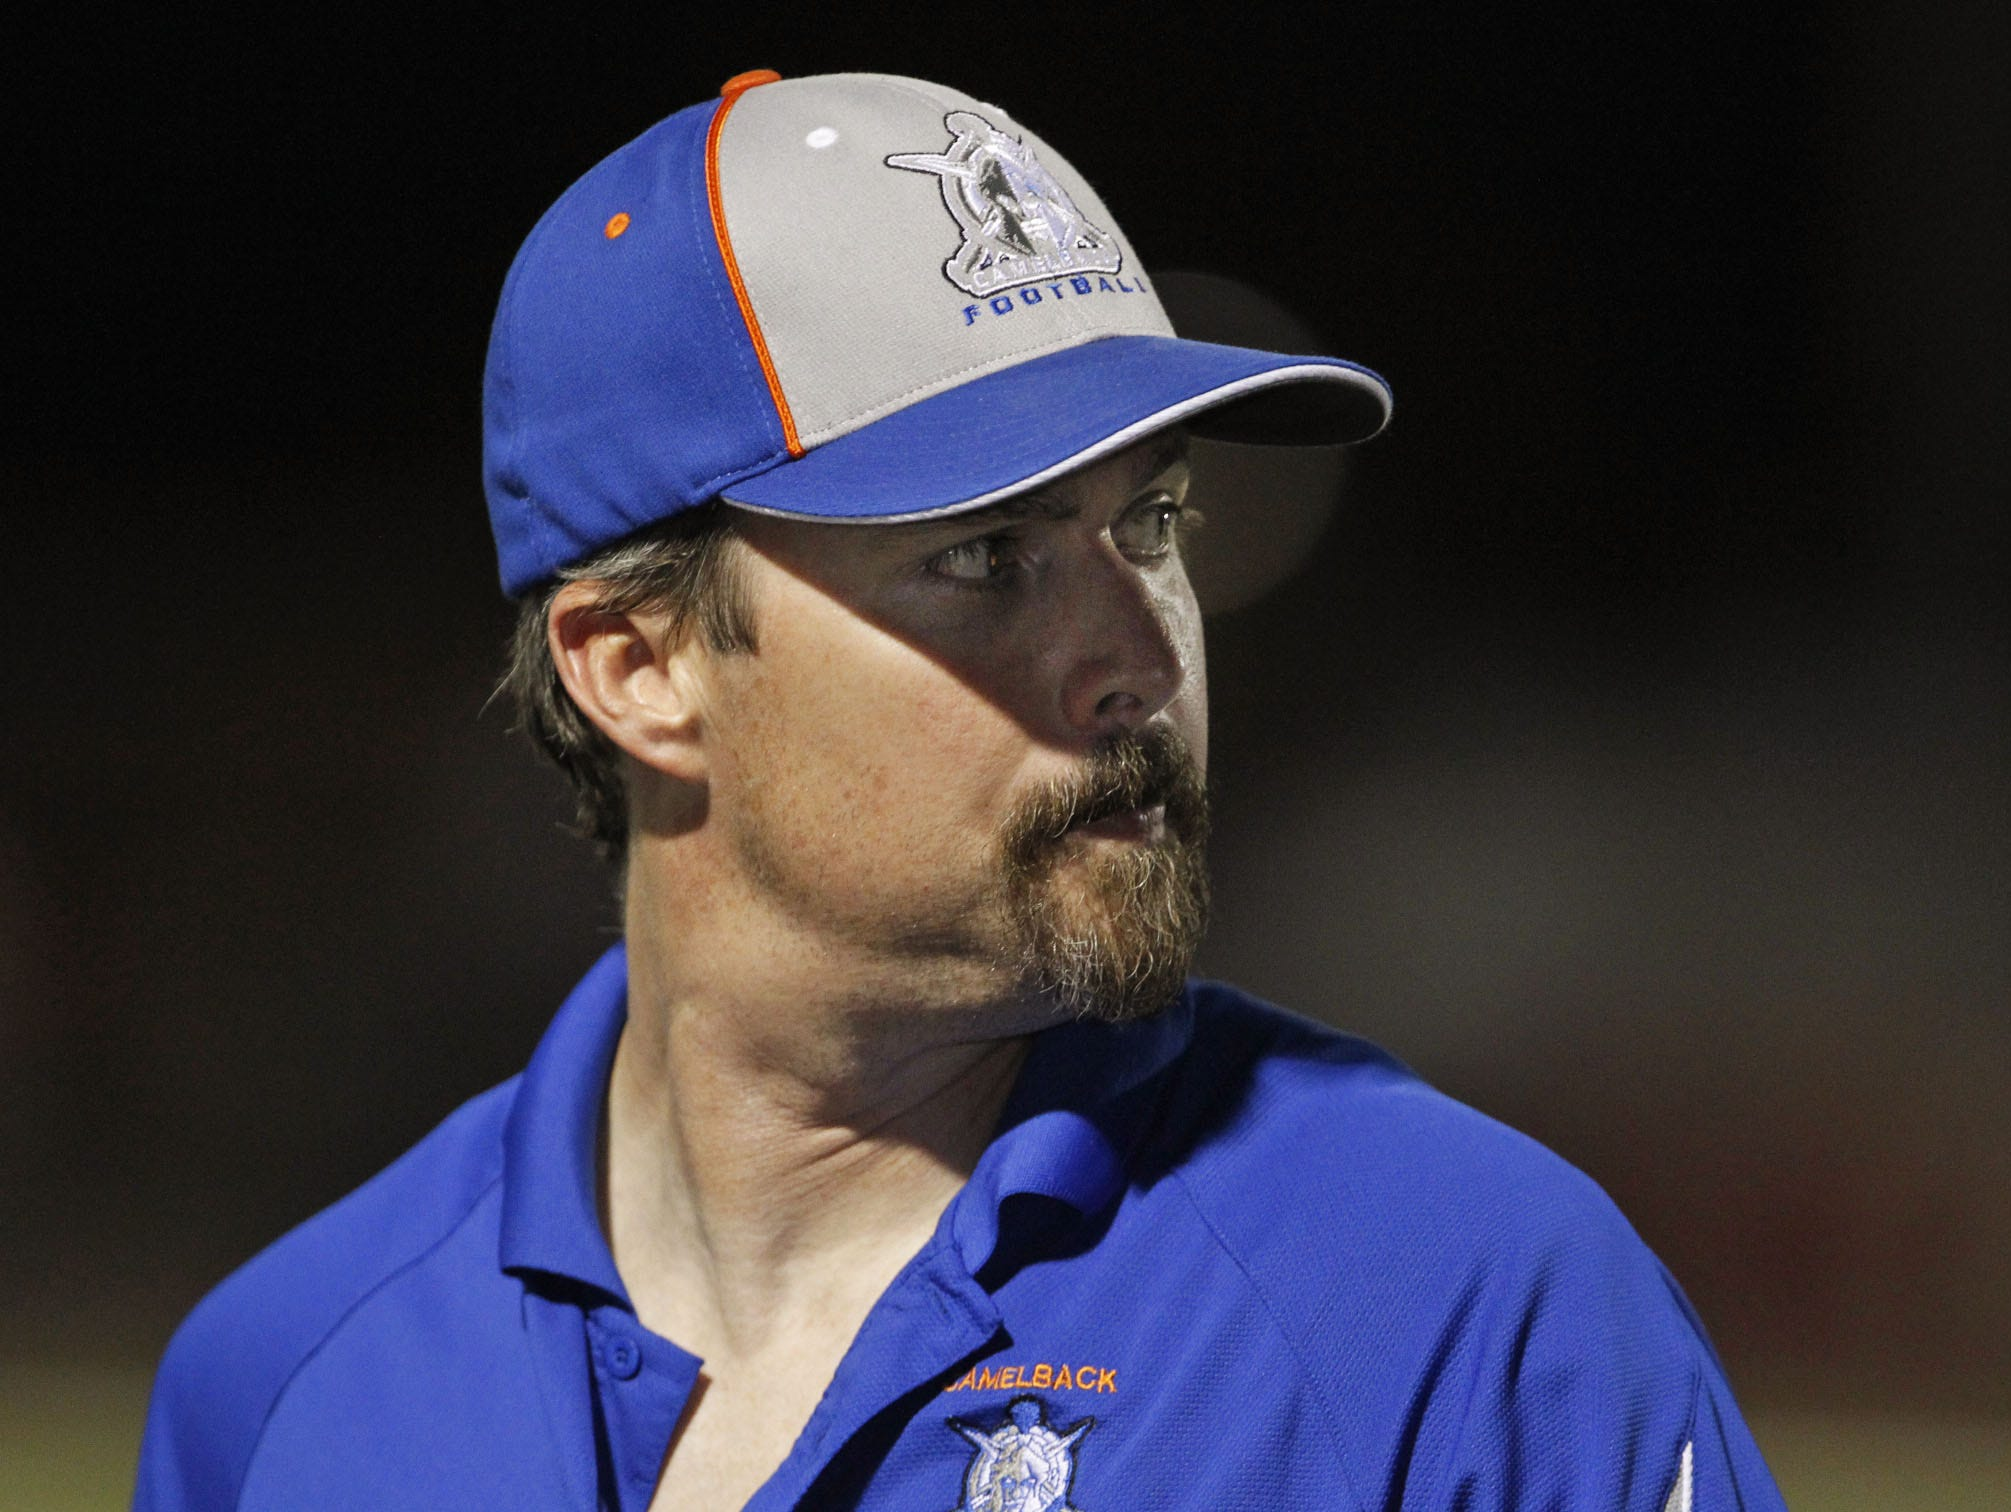 Brandon McNutt will serve as Camelback's interim coach the remainder of the season.